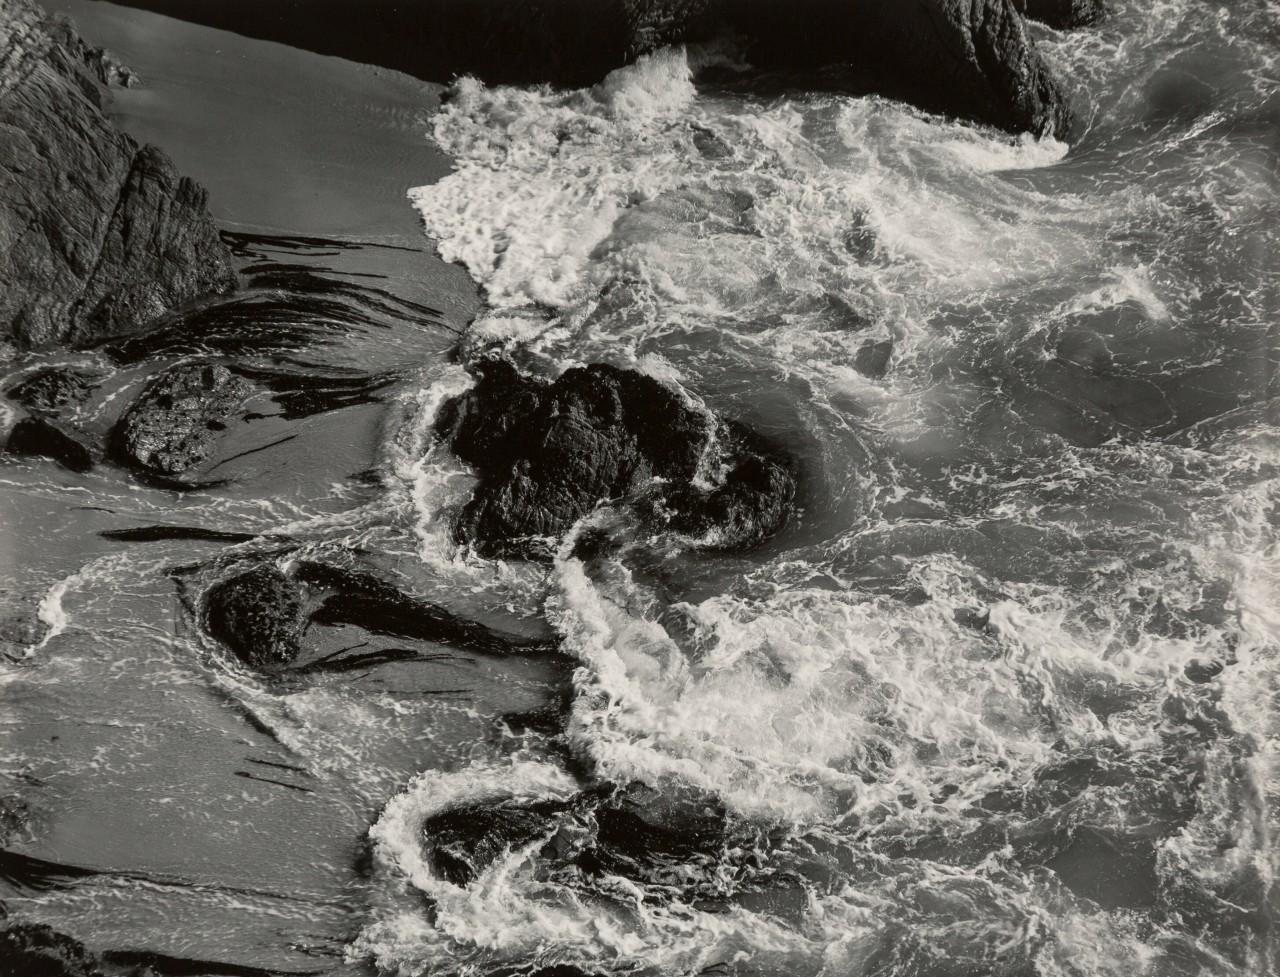 Прибой,1938. Фотограф Эдвард Уэстон